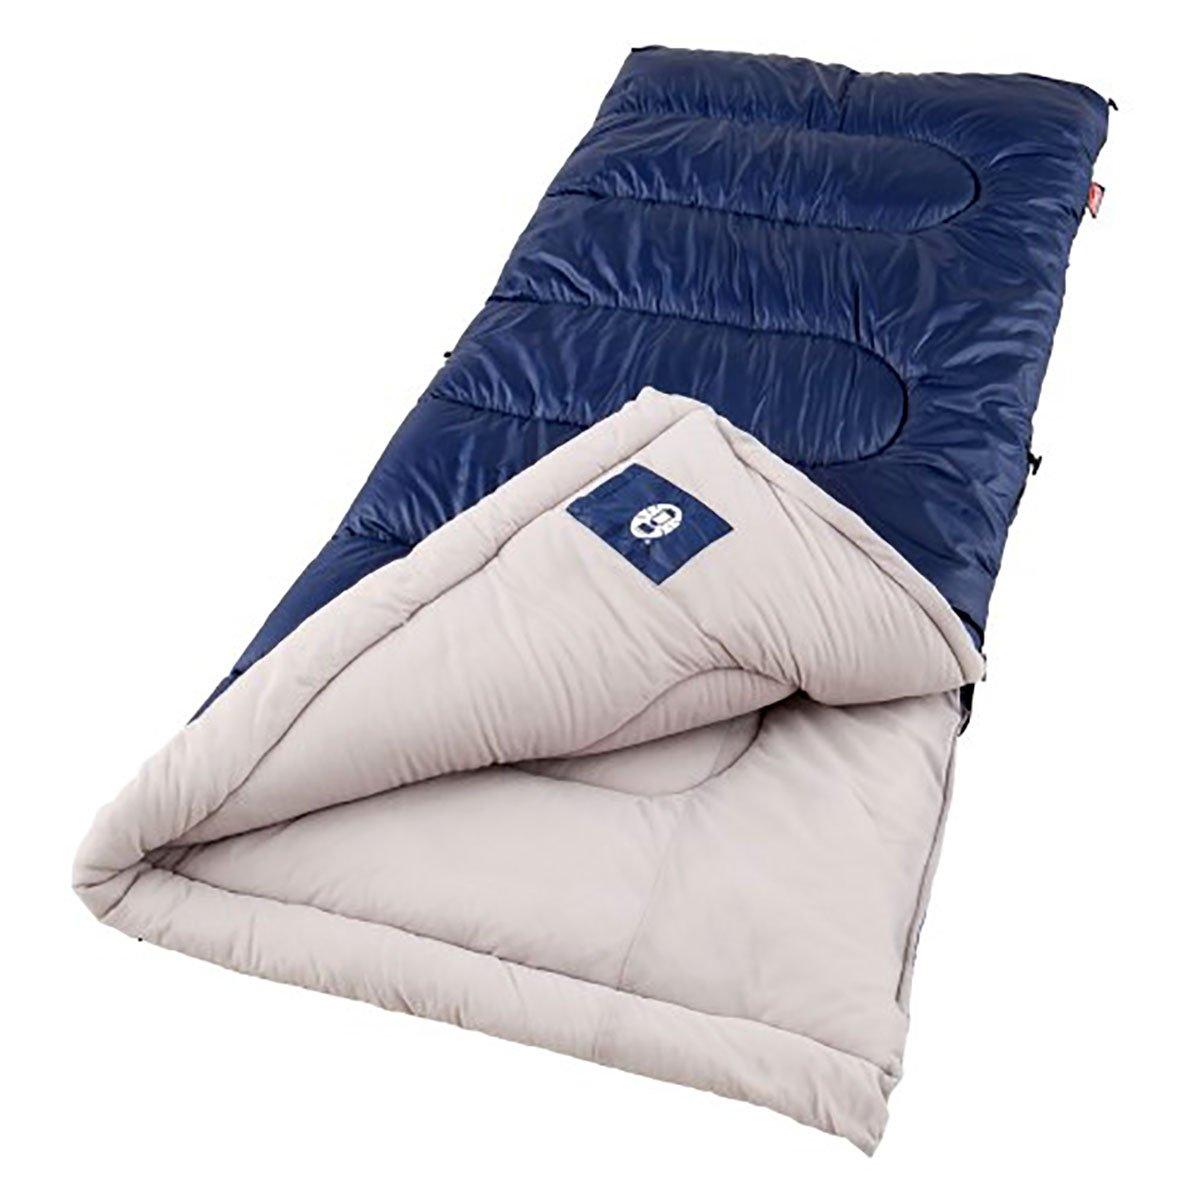 Coleman Sunridge 75 x 33インチ長方形Sleepingバッグブルー – 2000016328 B071Y414GV